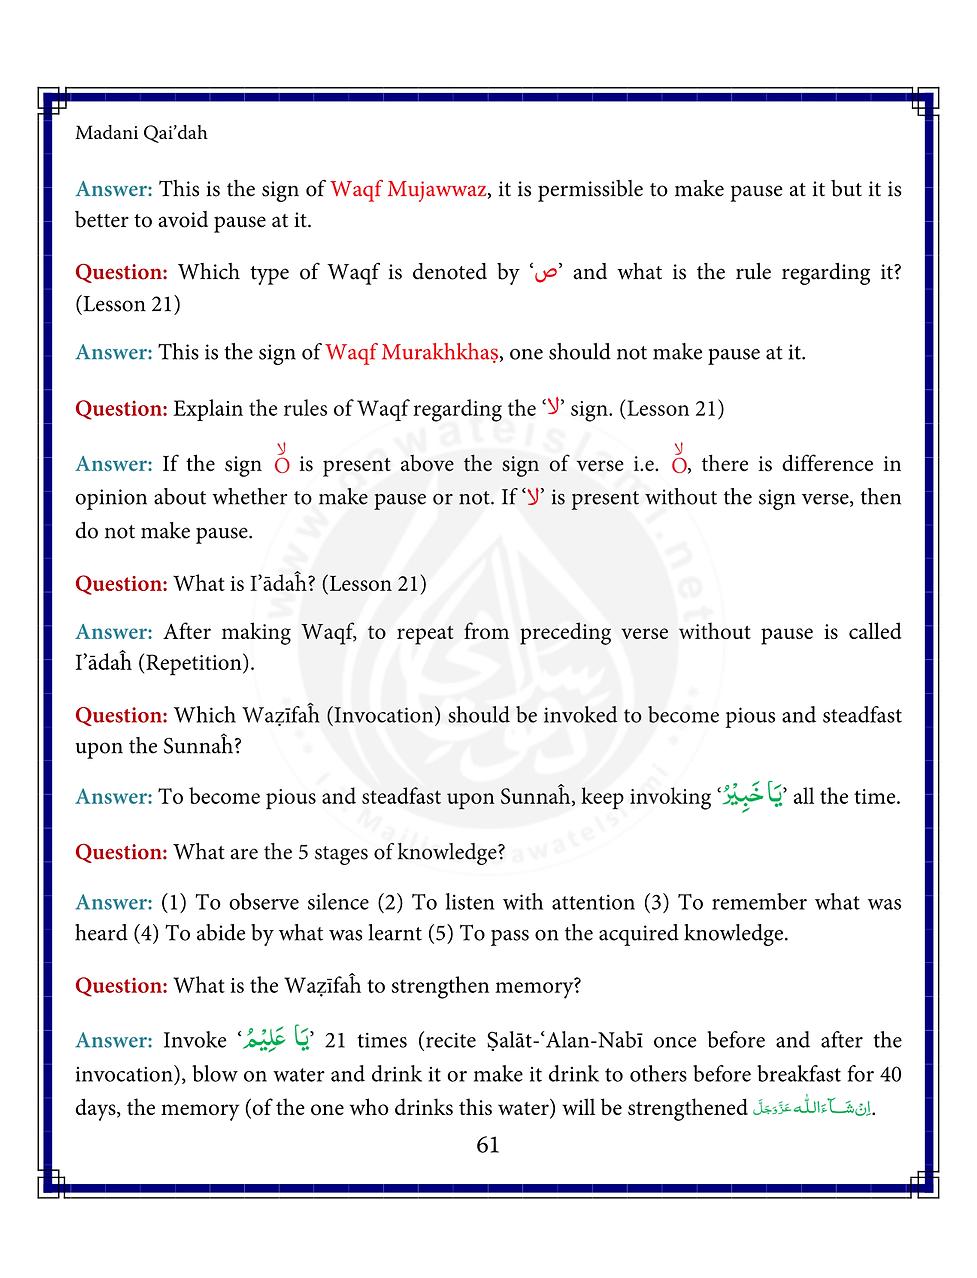 Madani Qaidah-71.png